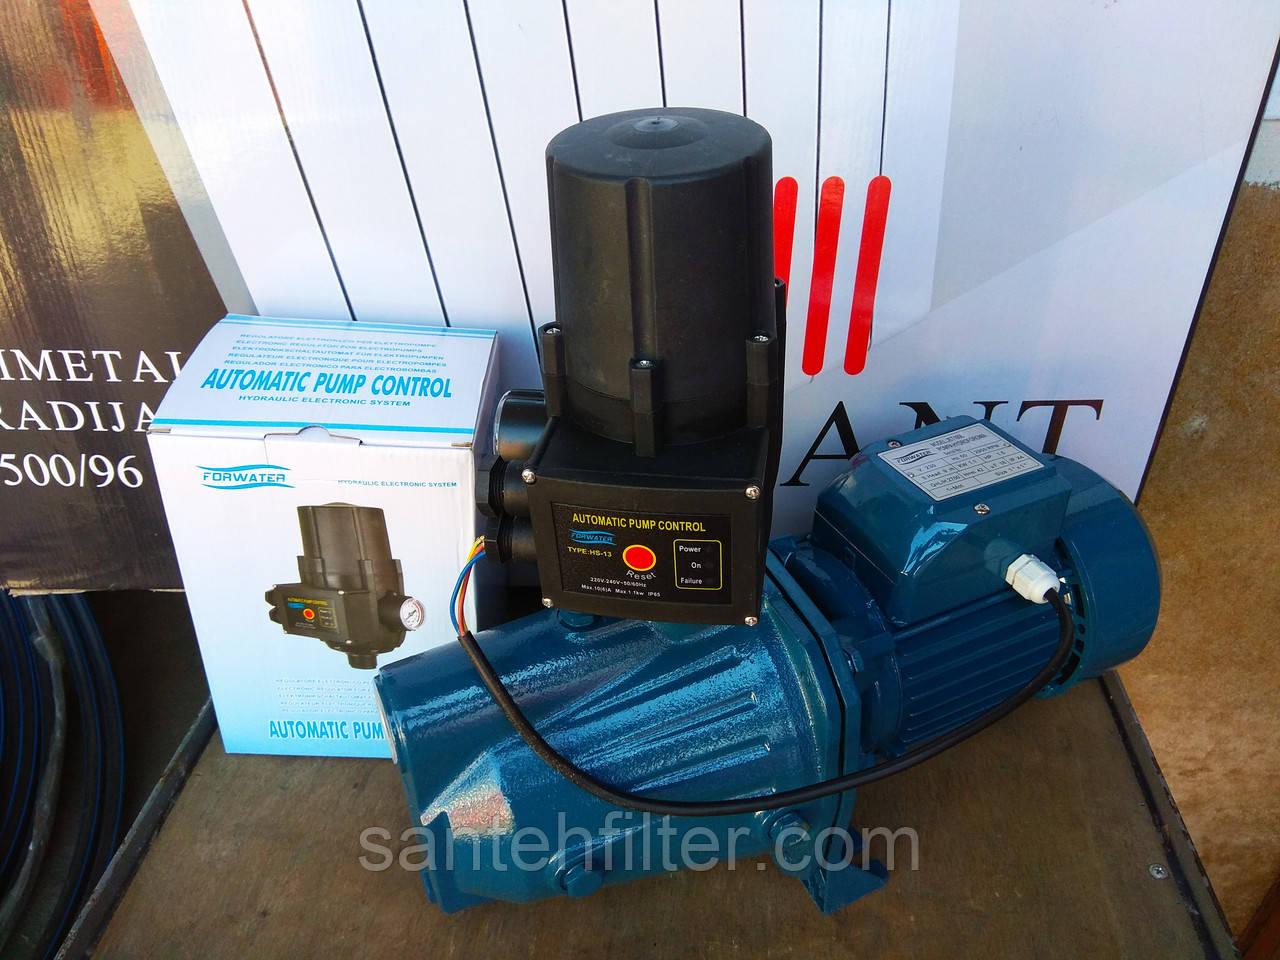 Насосная станция JET100L 1.1 кВт Forwater с регулятором давления HS-13